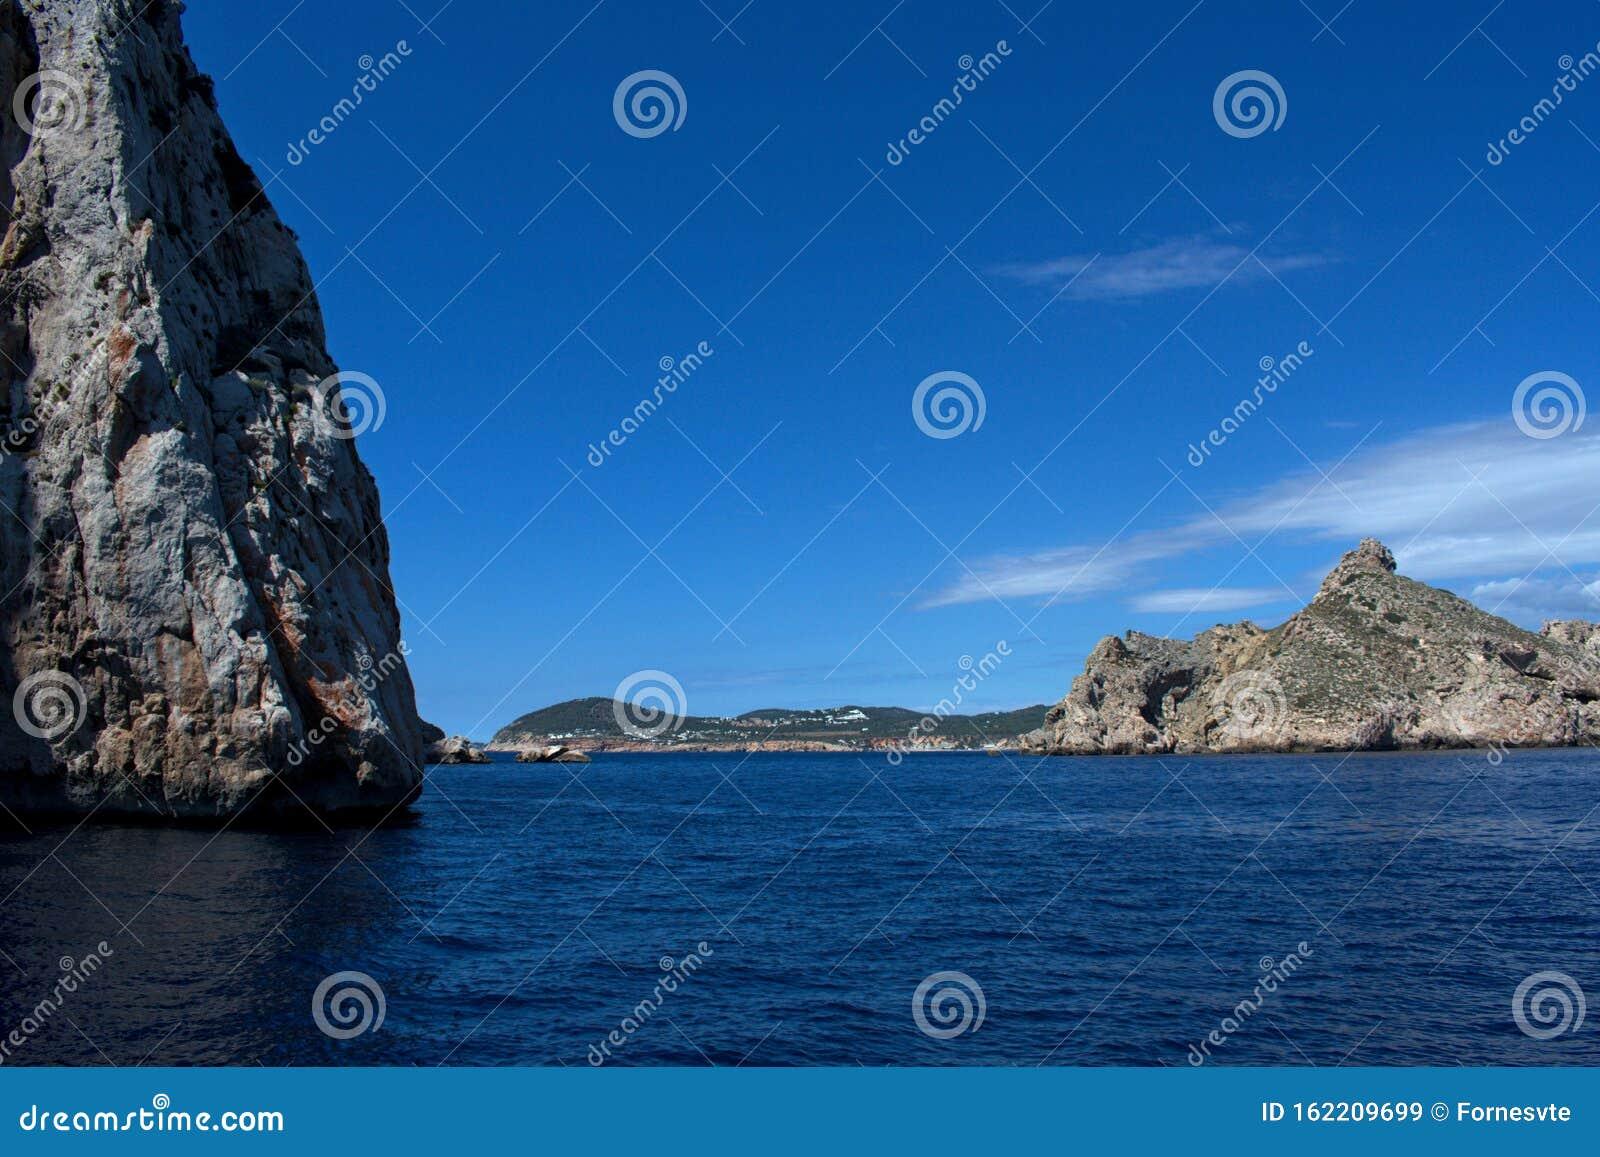 Small Islands Near San Antonio Ibiza Spain Stock Image Image Of Community Islands 162209699